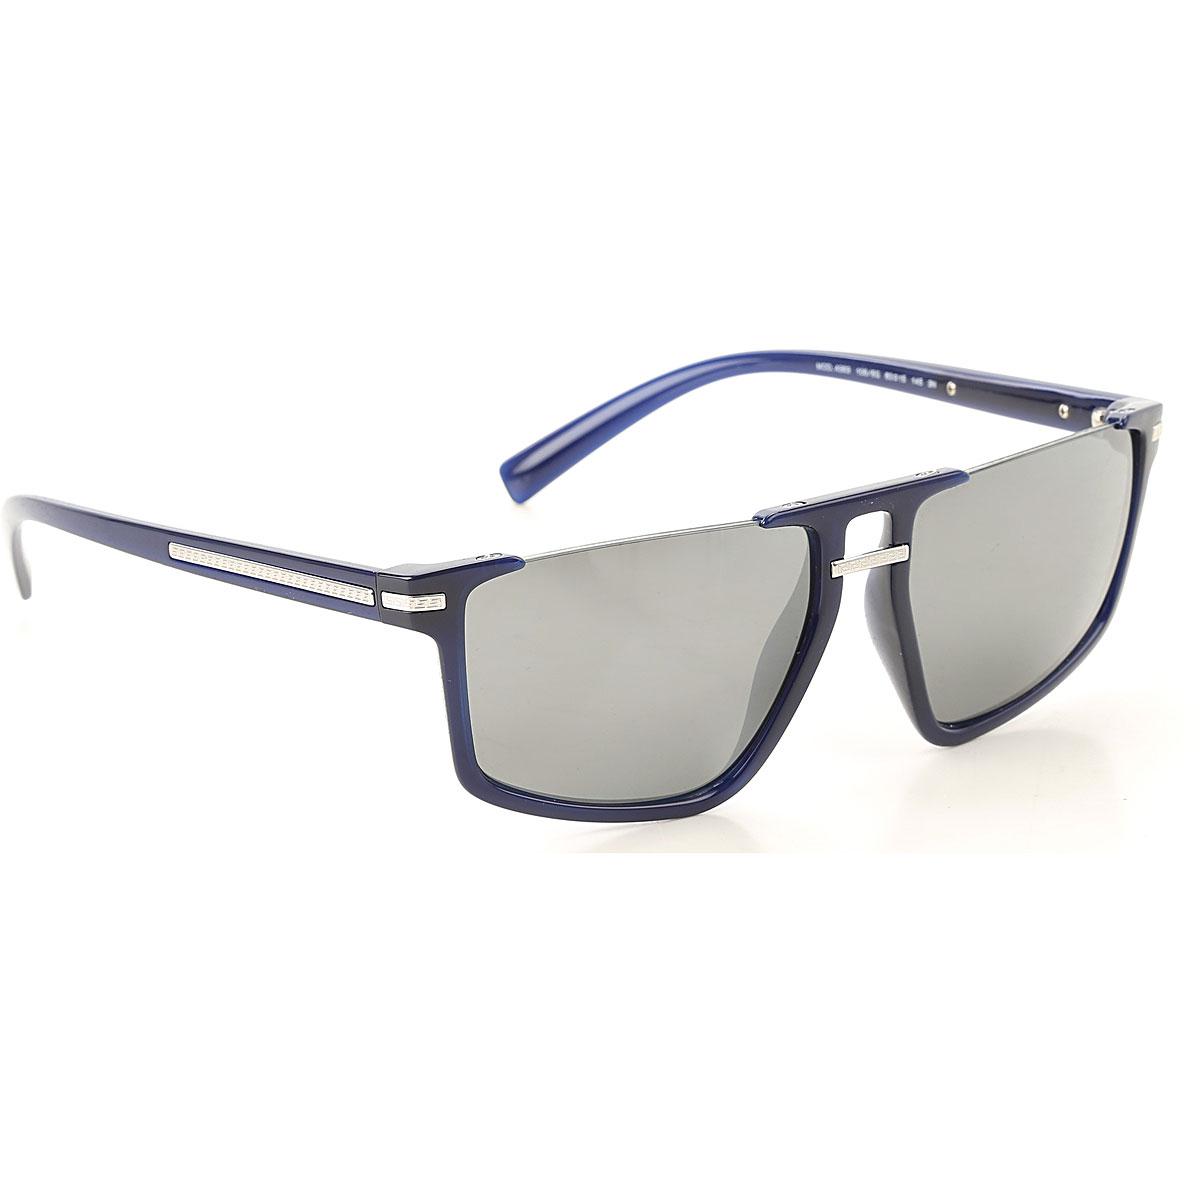 Gianni Versace Sunglasses On Sale, Blue, 2019